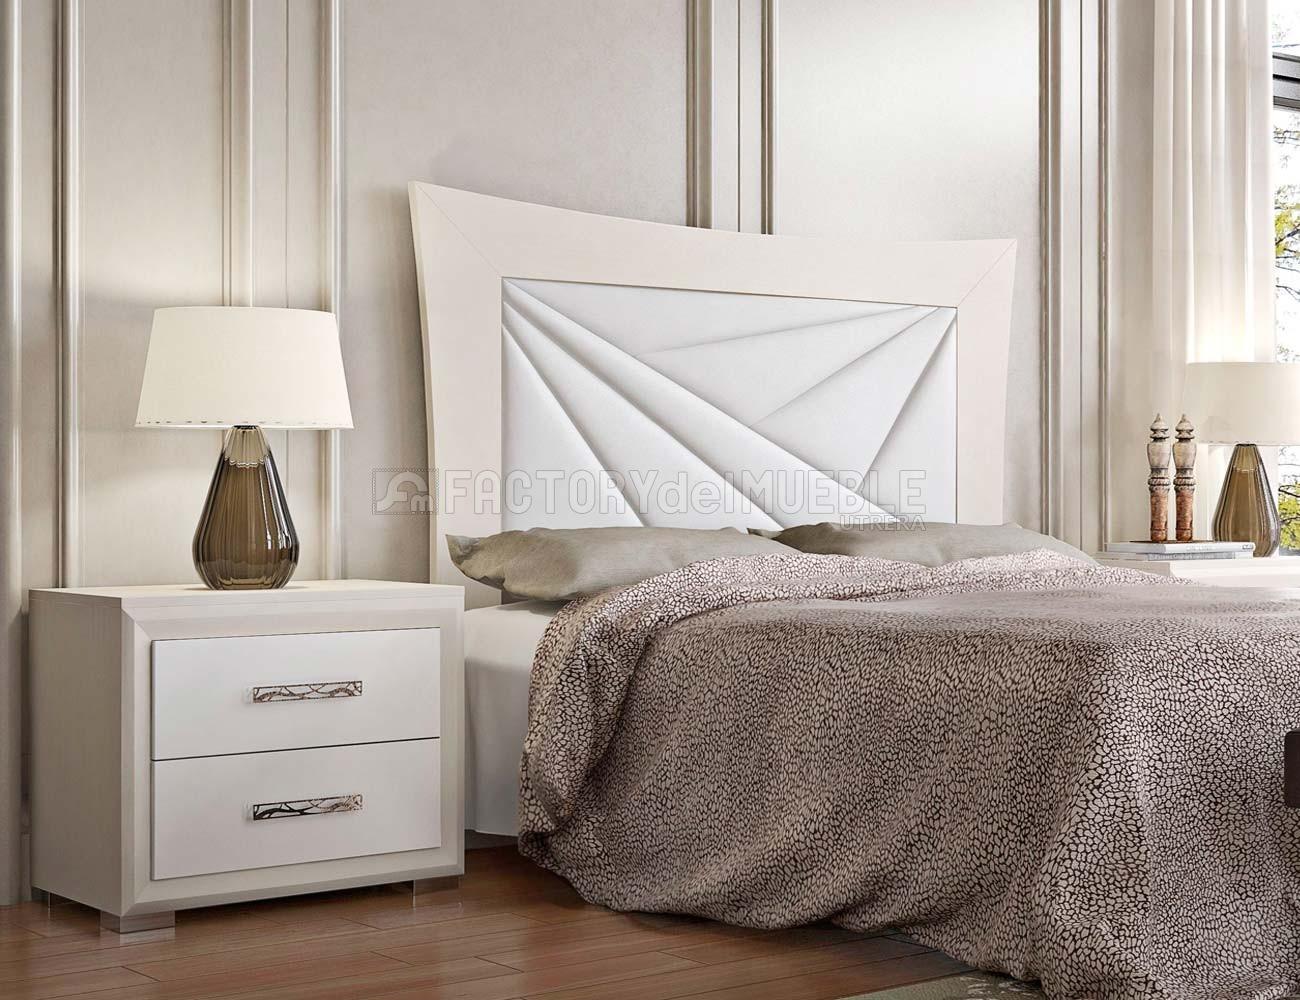 Dormitorio claudia promo21